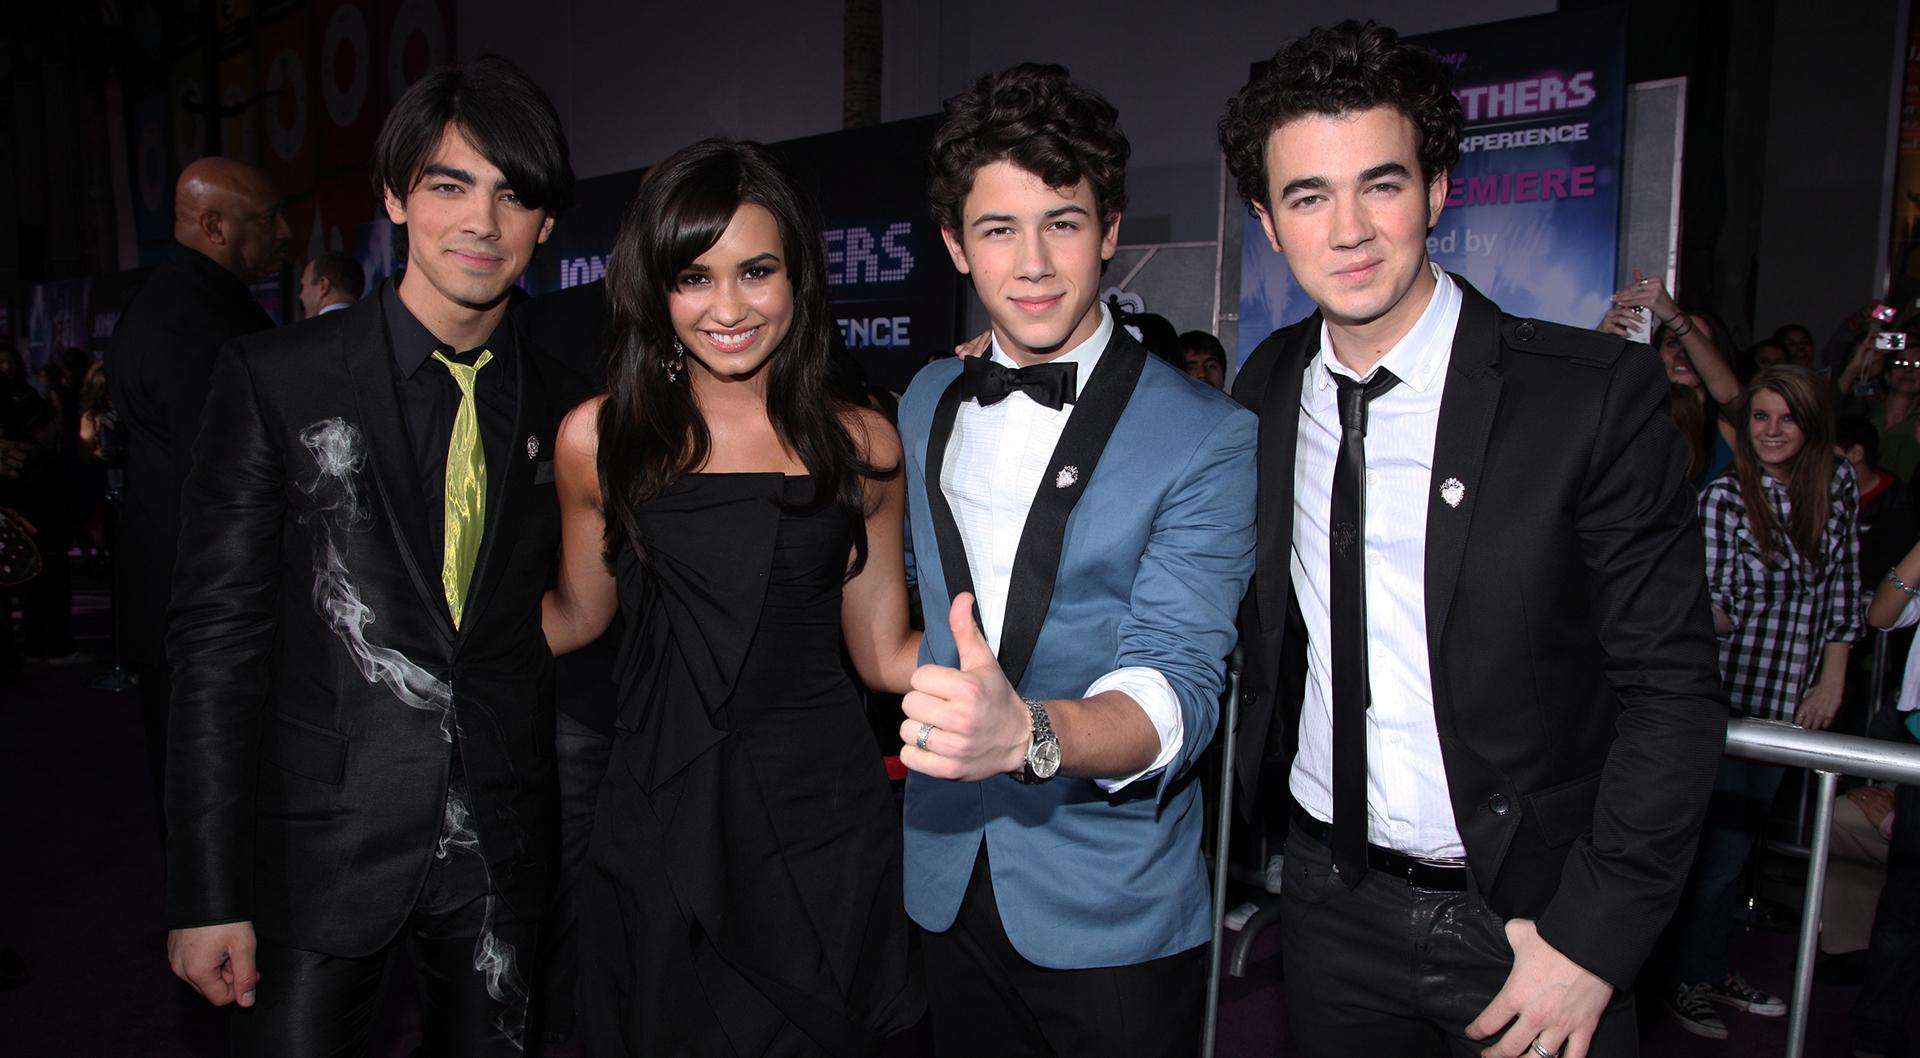 Jonas Brothers and Demi Lovato